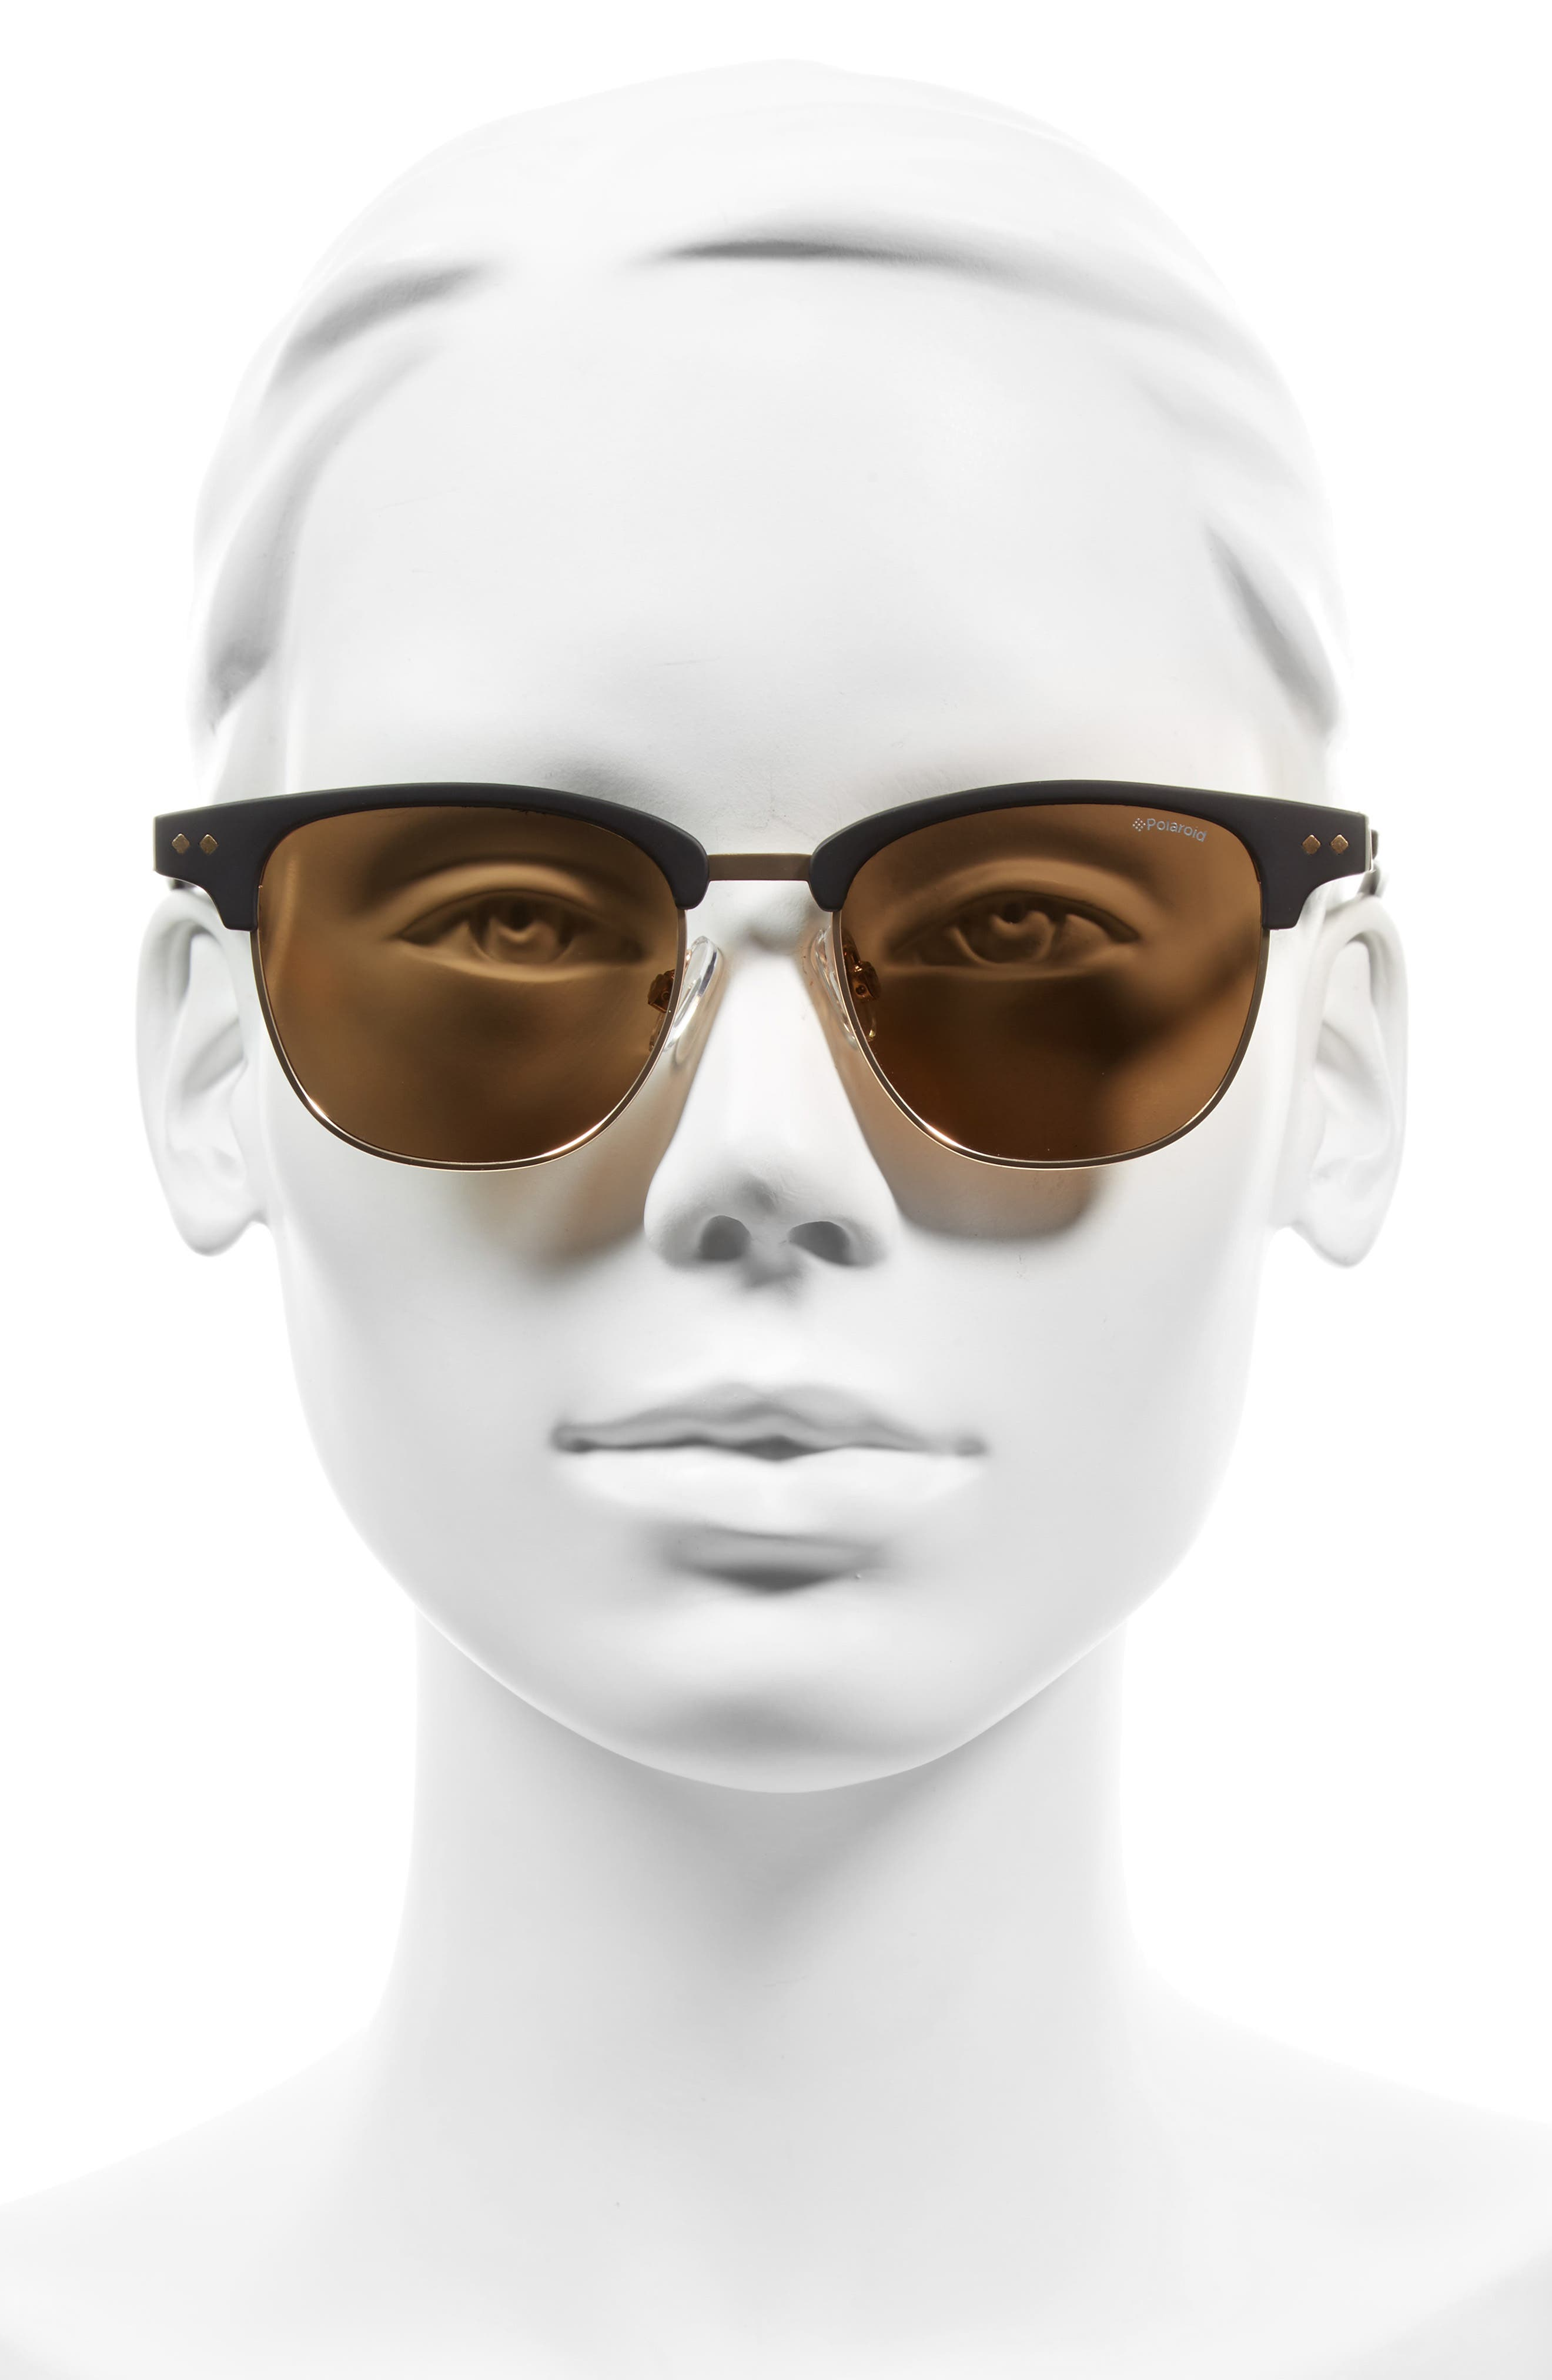 51mm Polarized Cat Eye Sunglasses,                             Alternate thumbnail 2, color,                             001